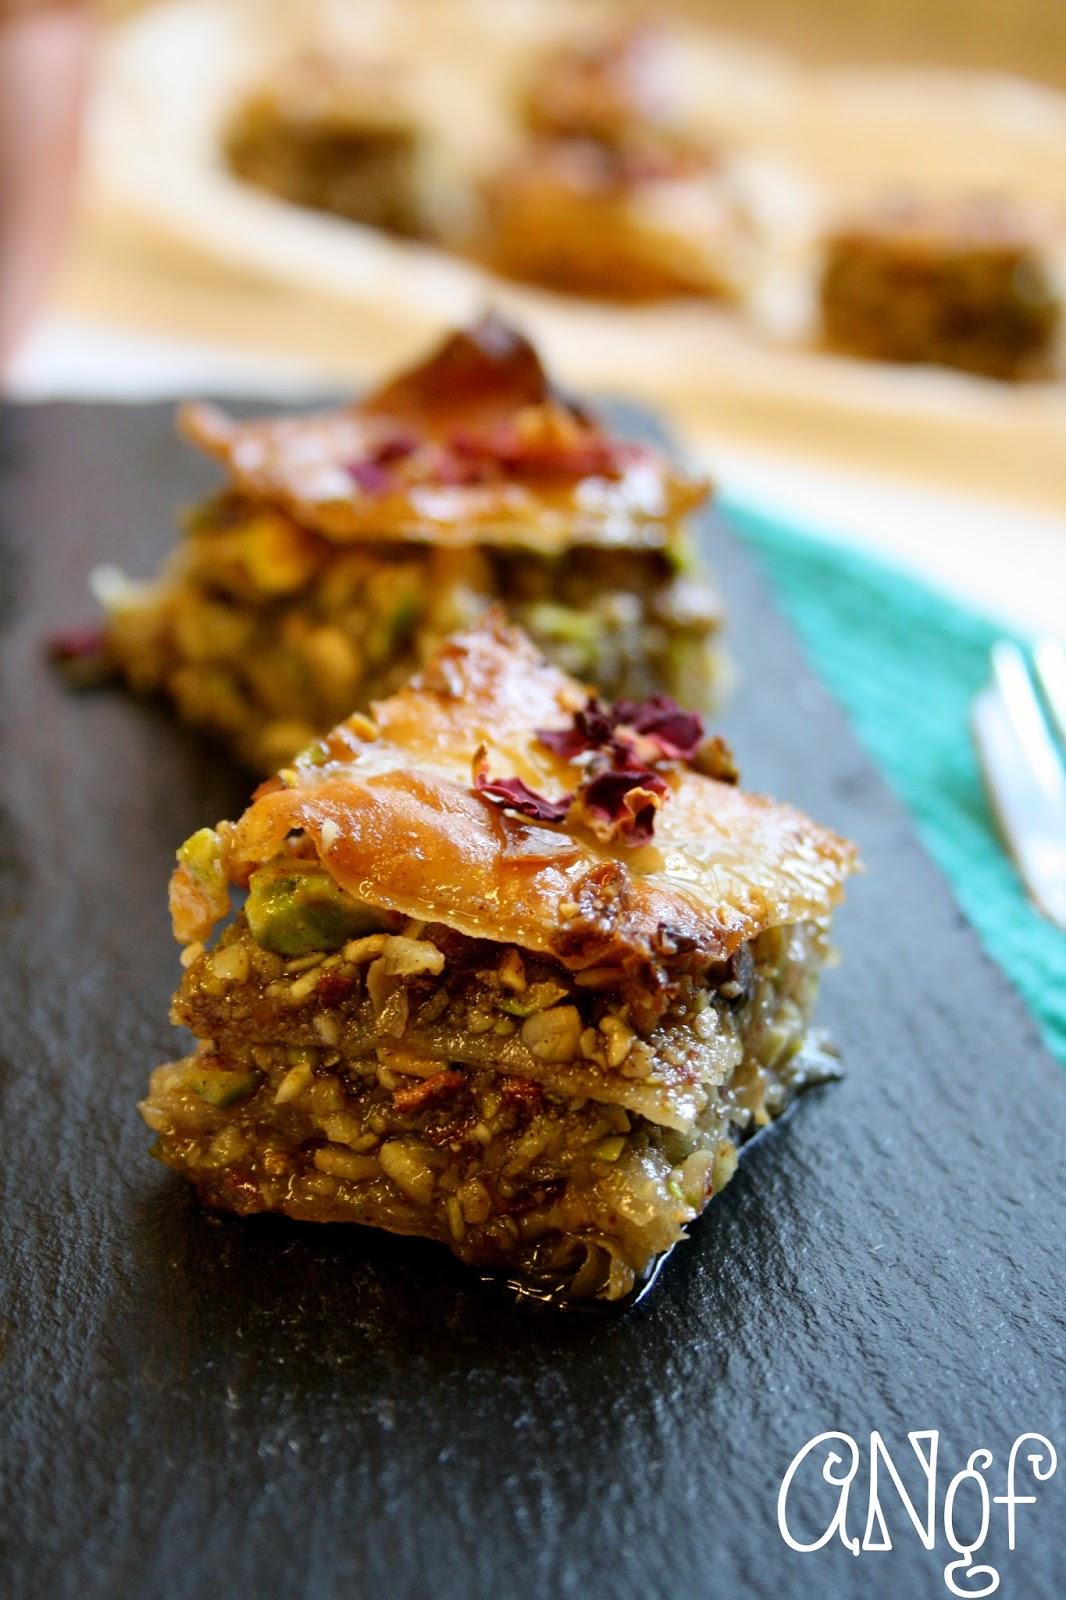 Anyonita Nibbles Gluten Free Recipes Gluten Free Pistachio Rose Baklava